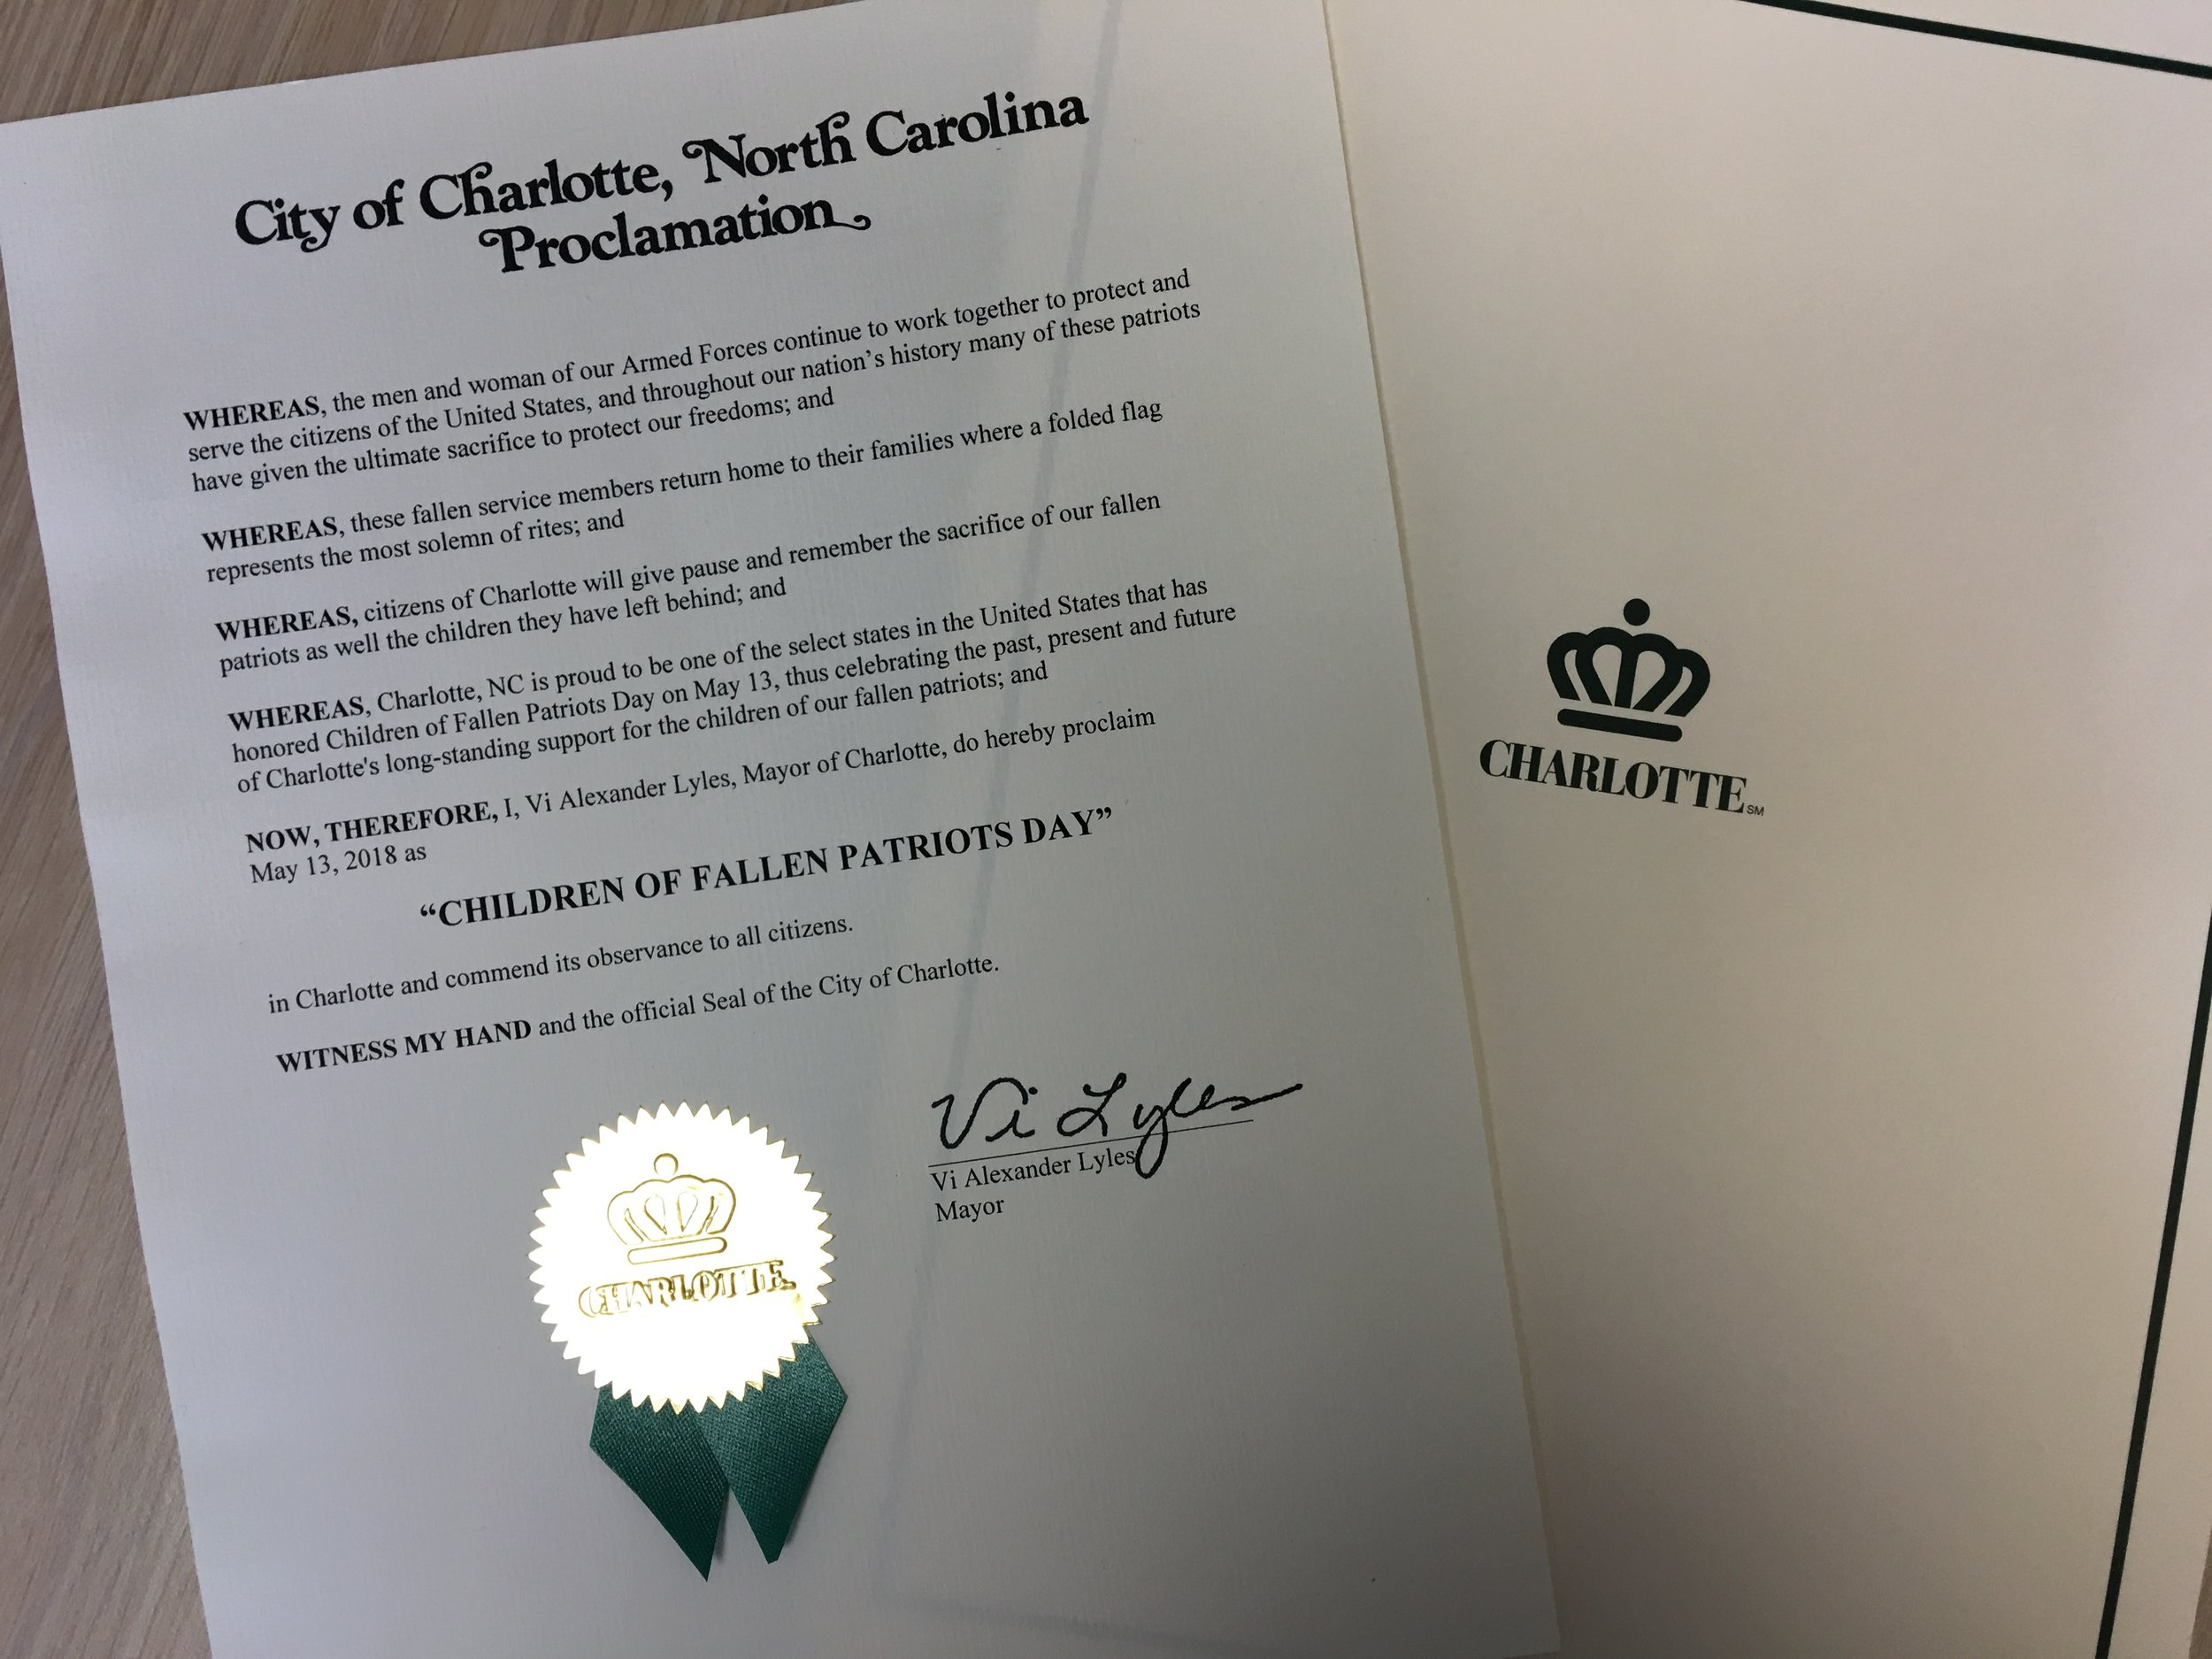 Charlotte, North Carolina 2018 Proclamation.JPG